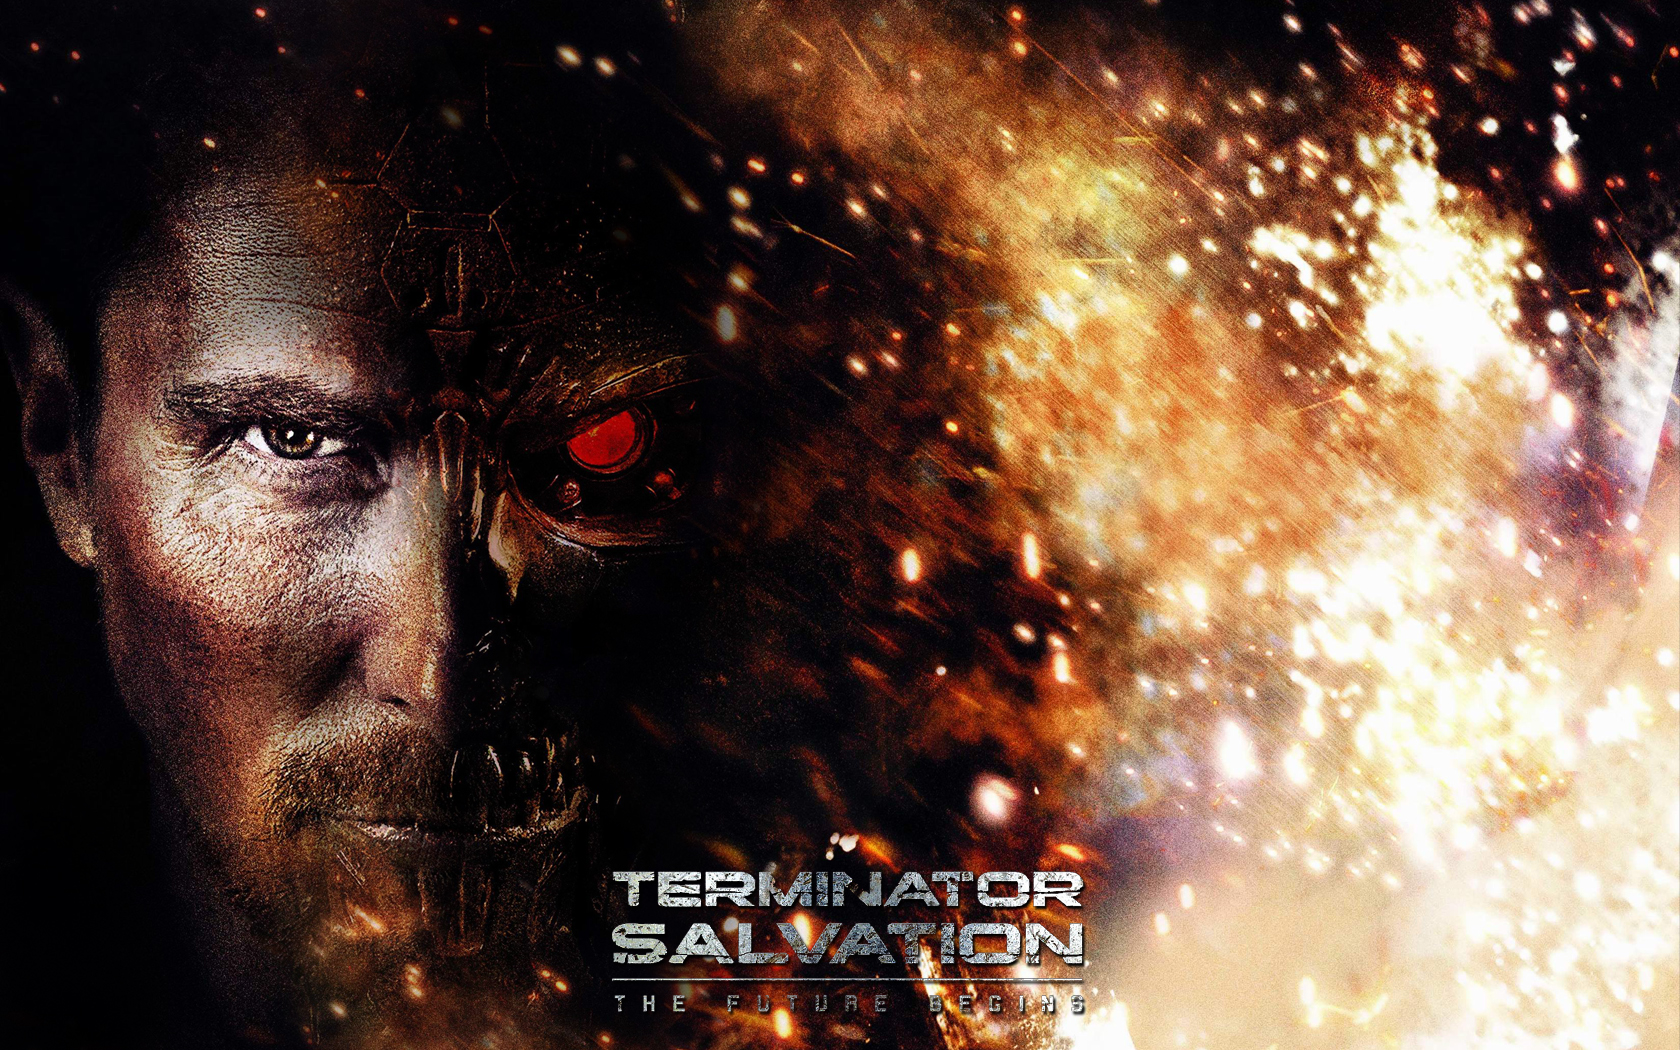 Terminator Wallpapers - Full HD wallpaper search